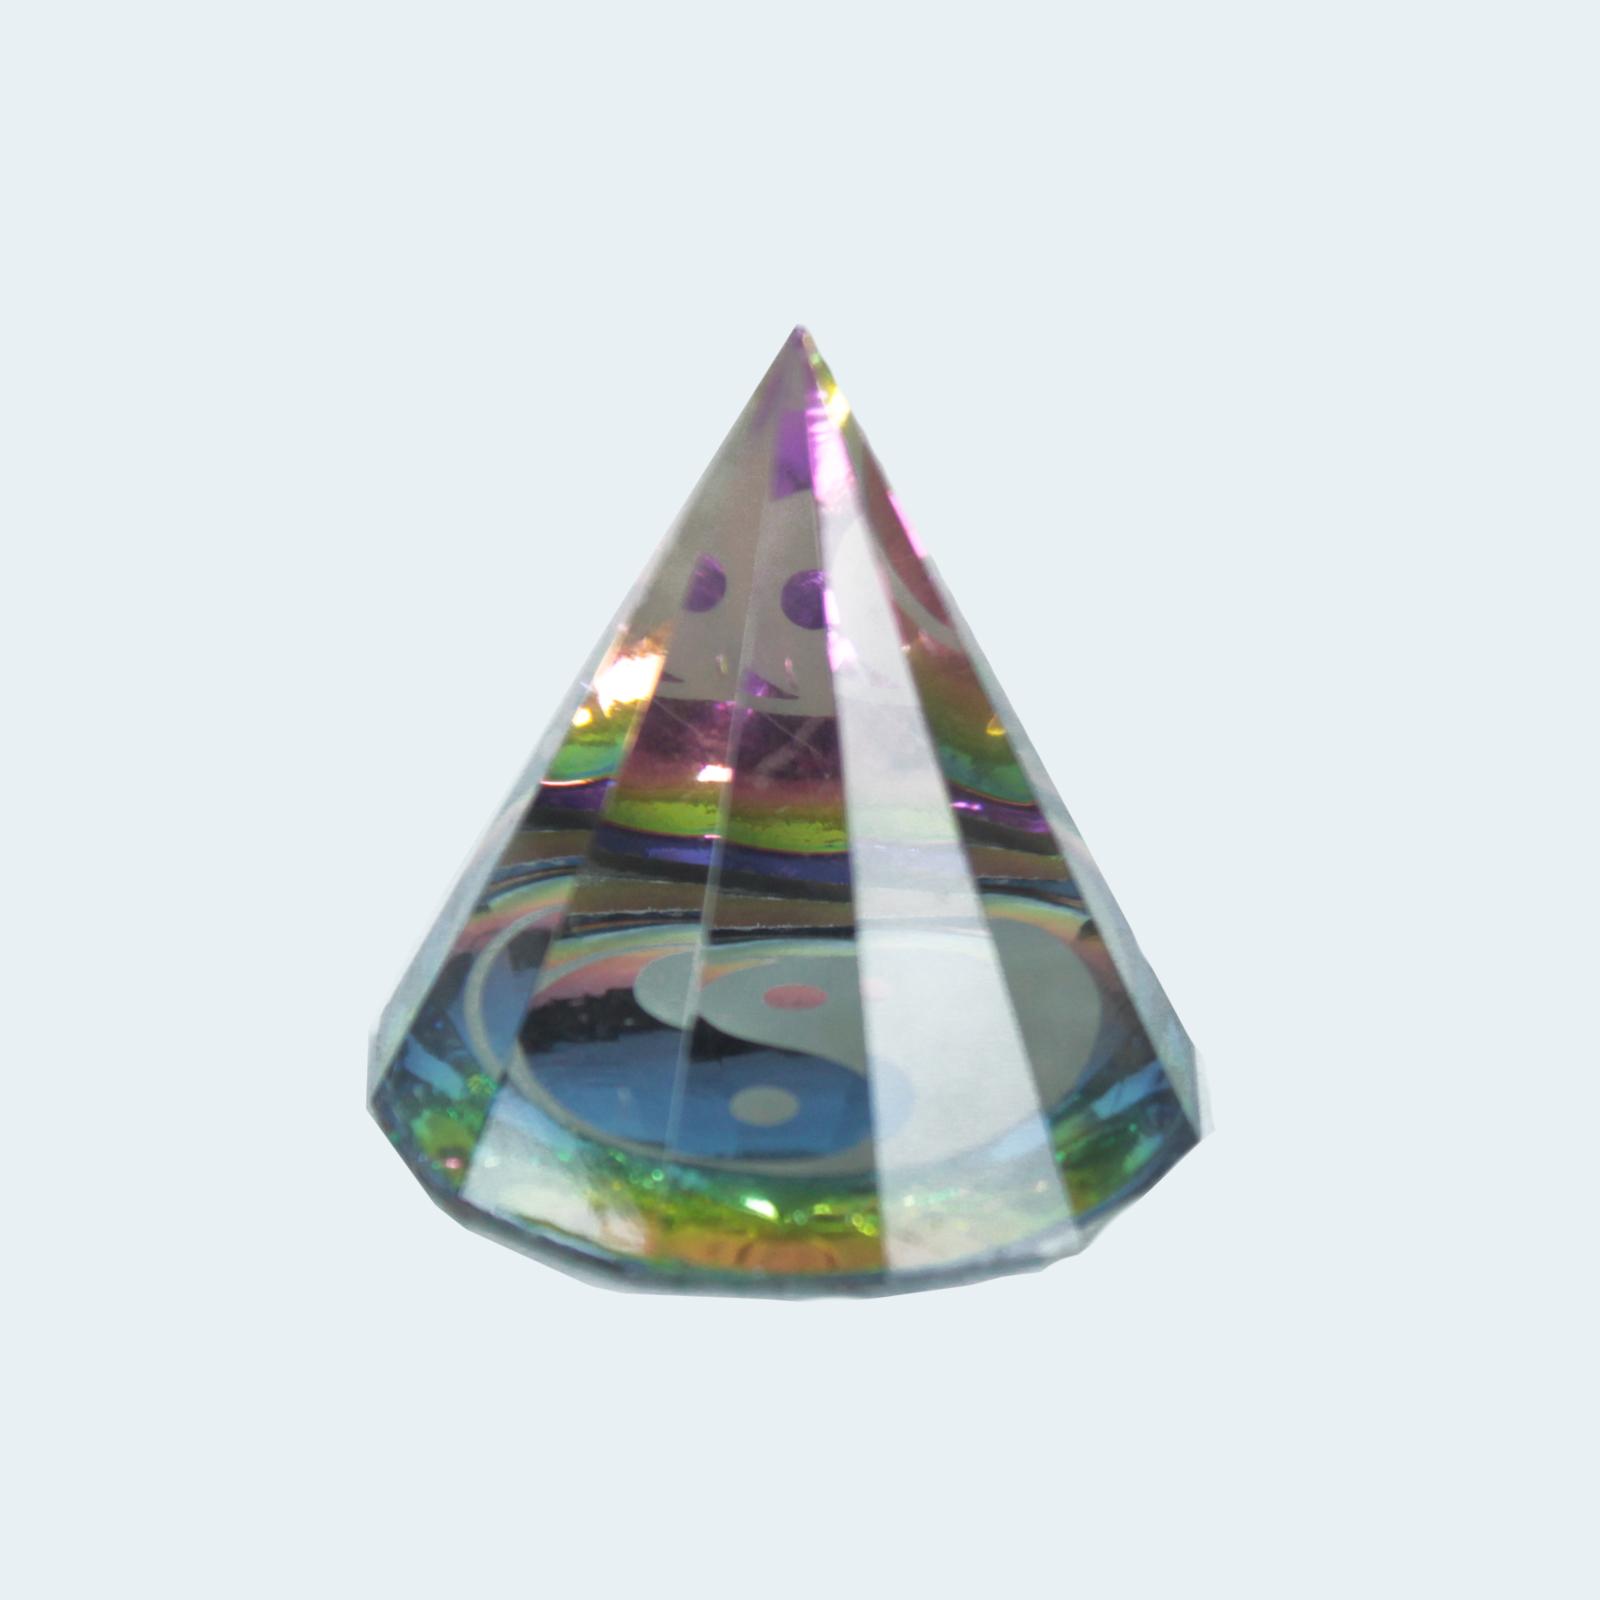 12 Sided Yin Yang Pyramid 40 mm